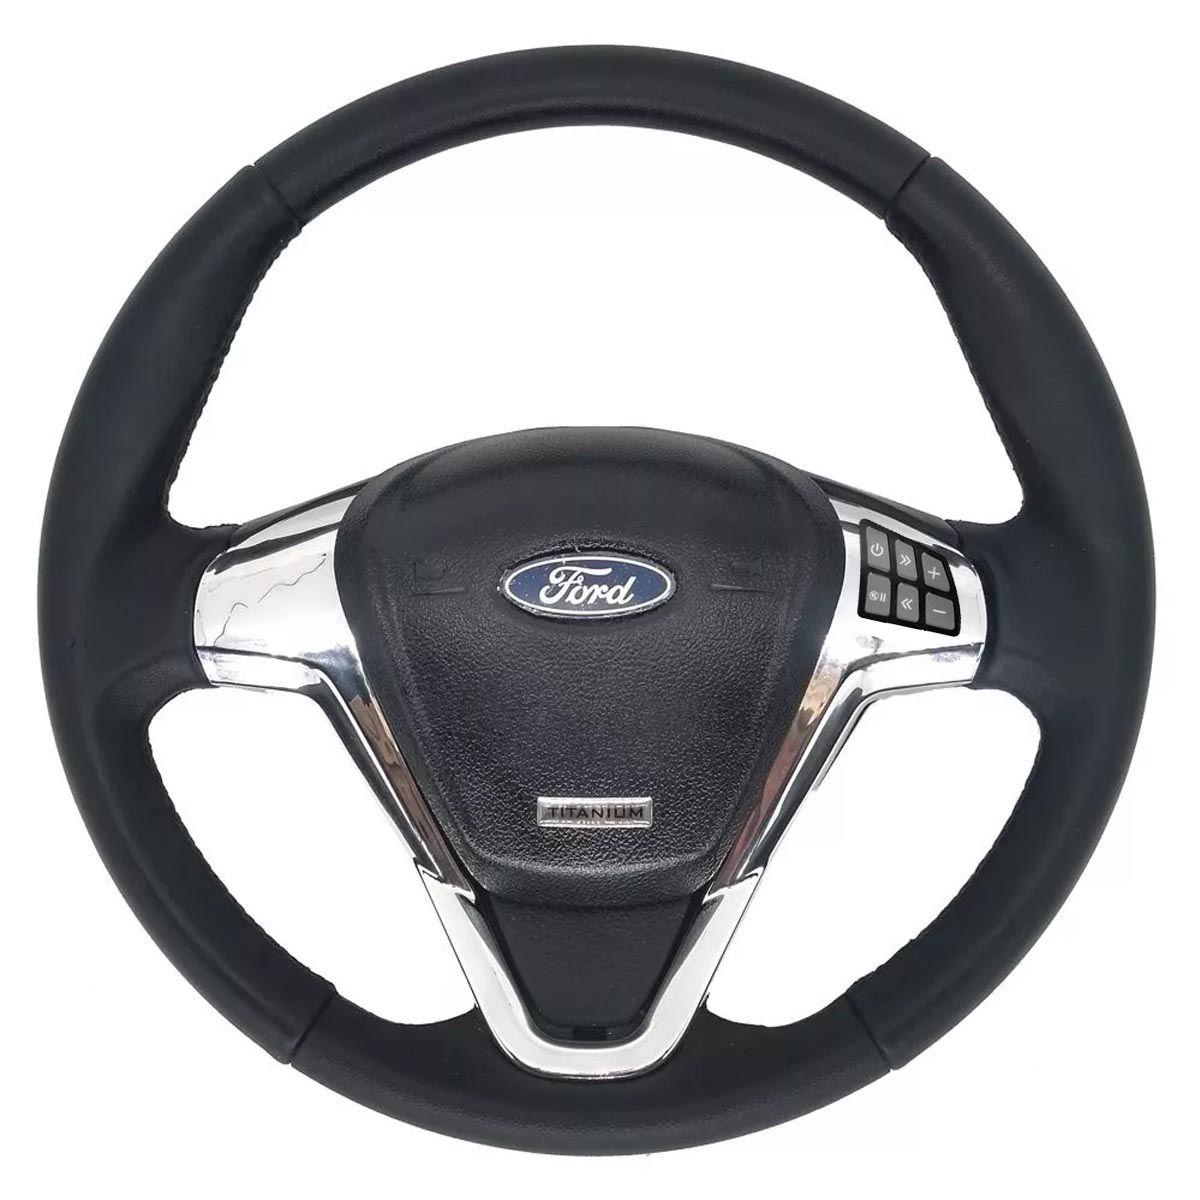 Volante Multifuncional Titanium Escort Zetec Fiesta Ka Ecosport Courier Ford com Tampa Acionador de Buzina